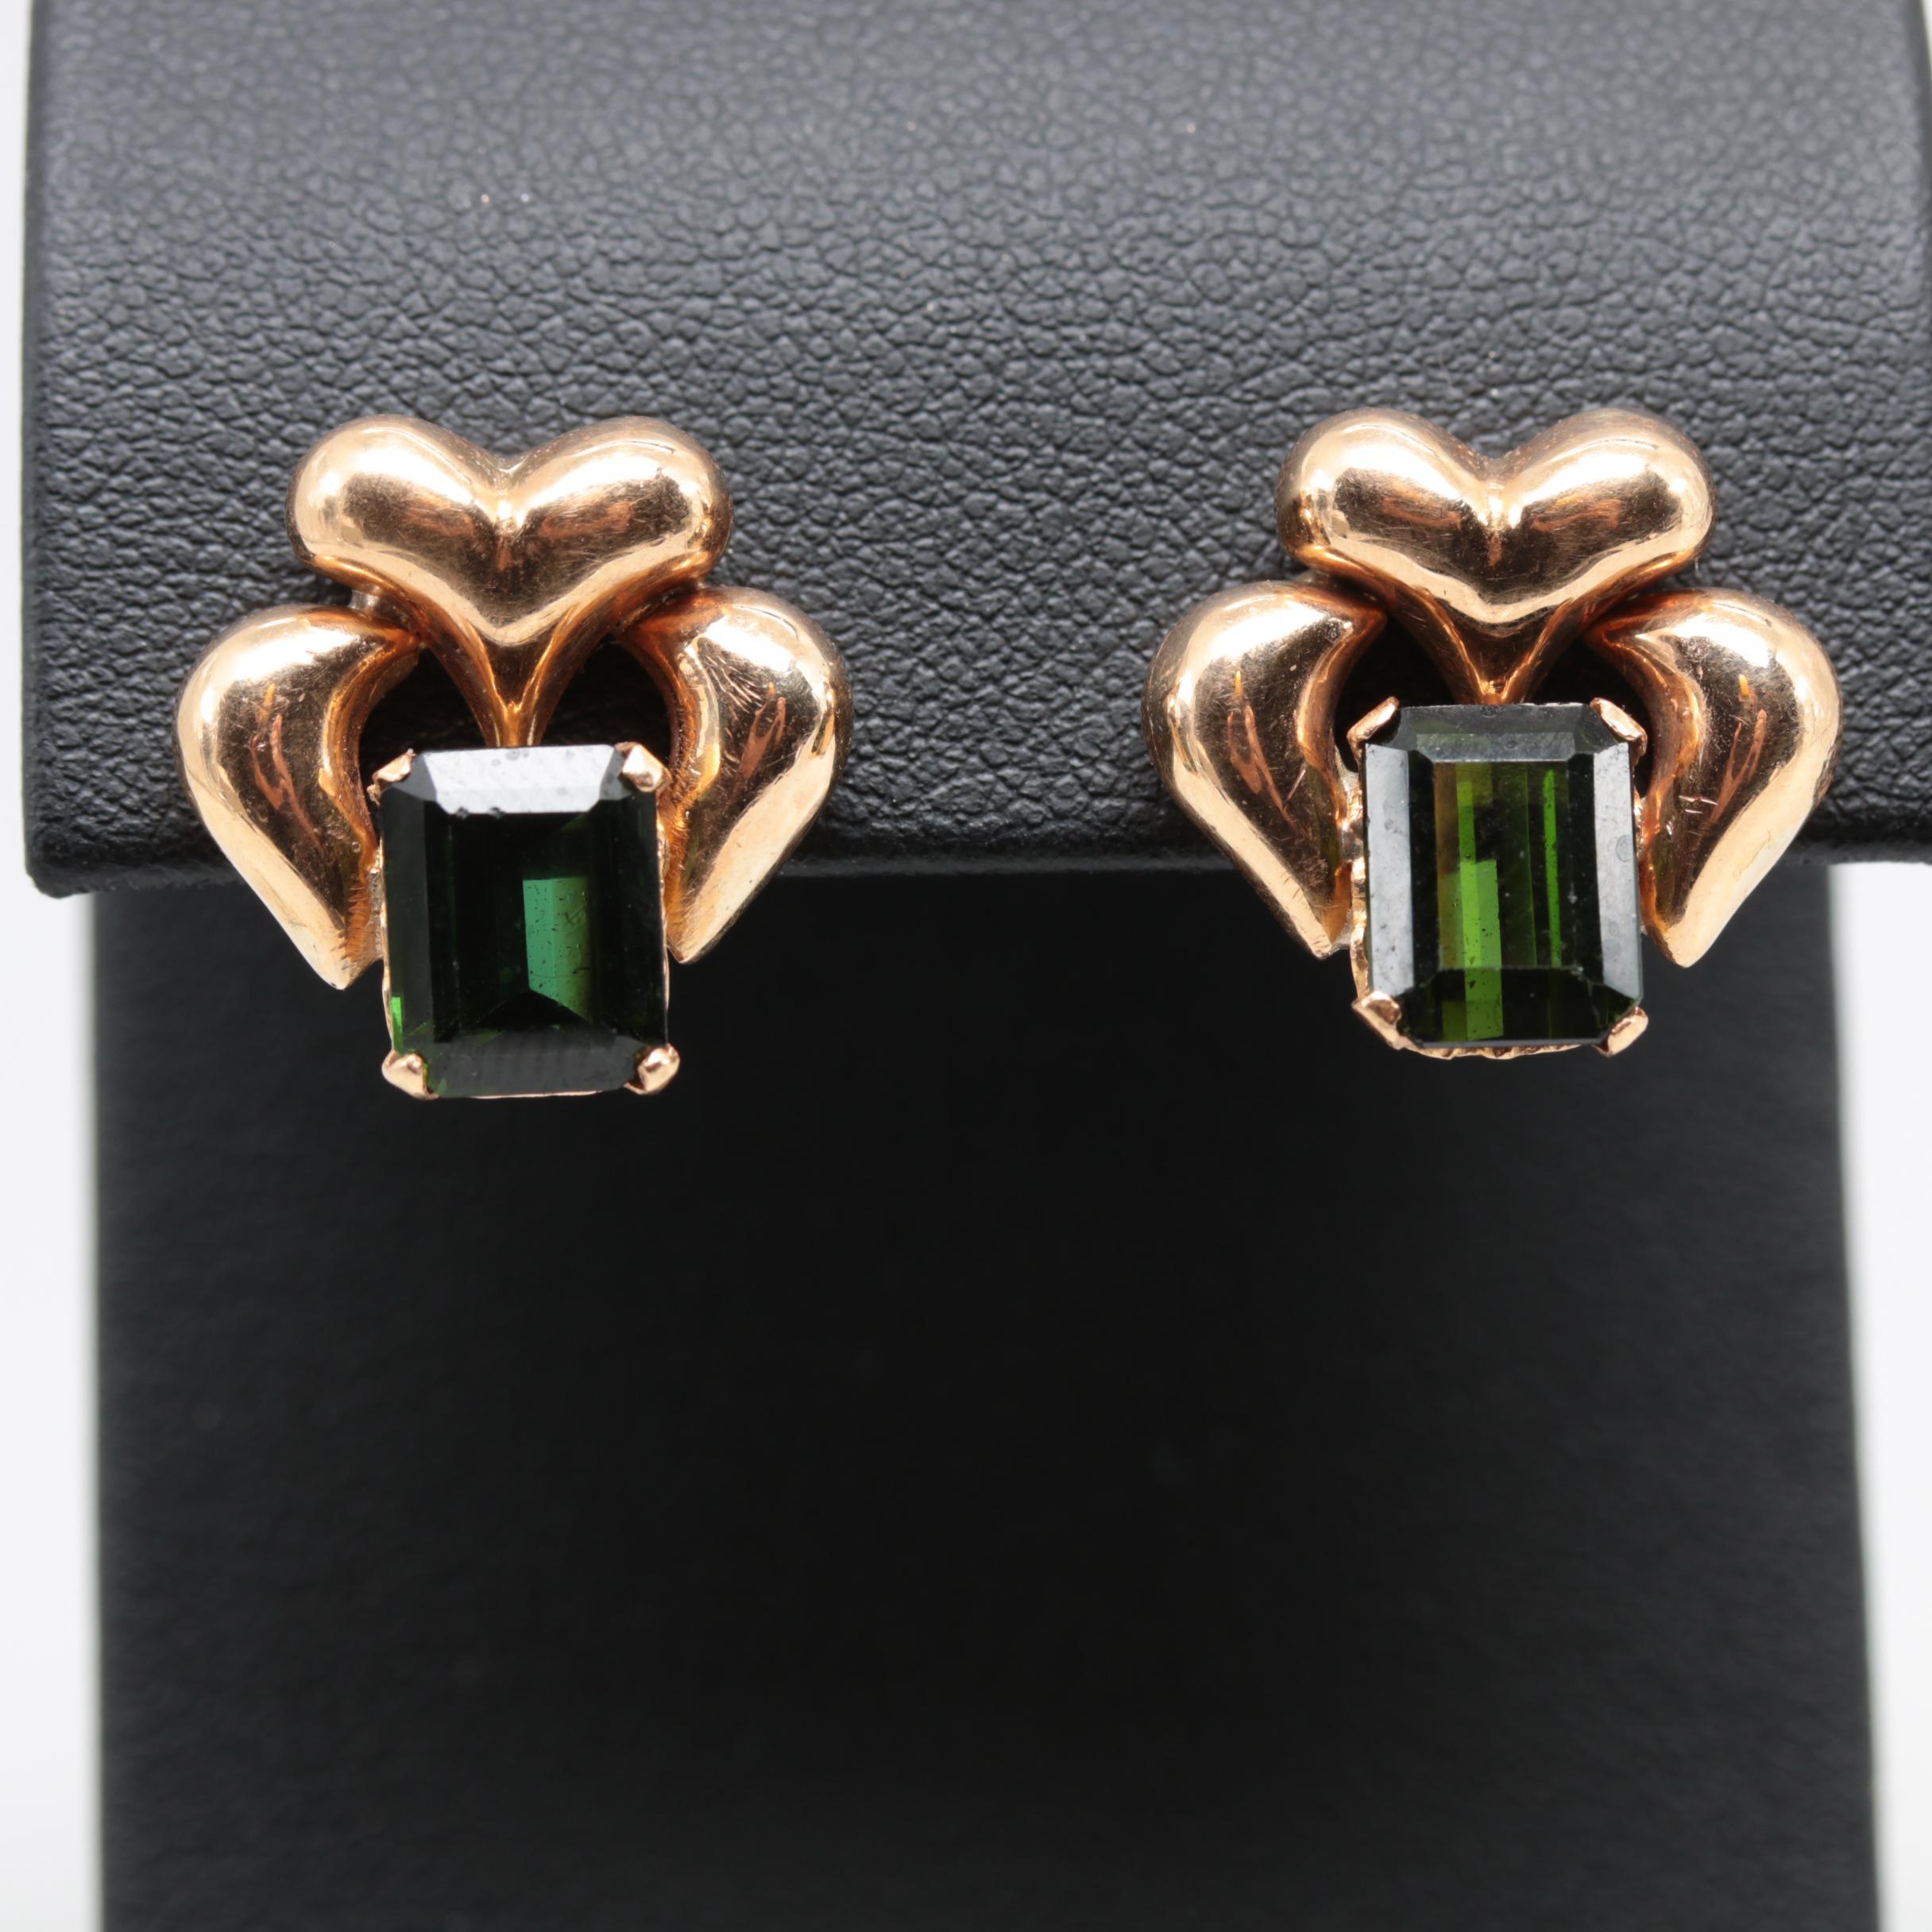 18K Yellow Gold Green Tourmaline Threaded Back Earrings